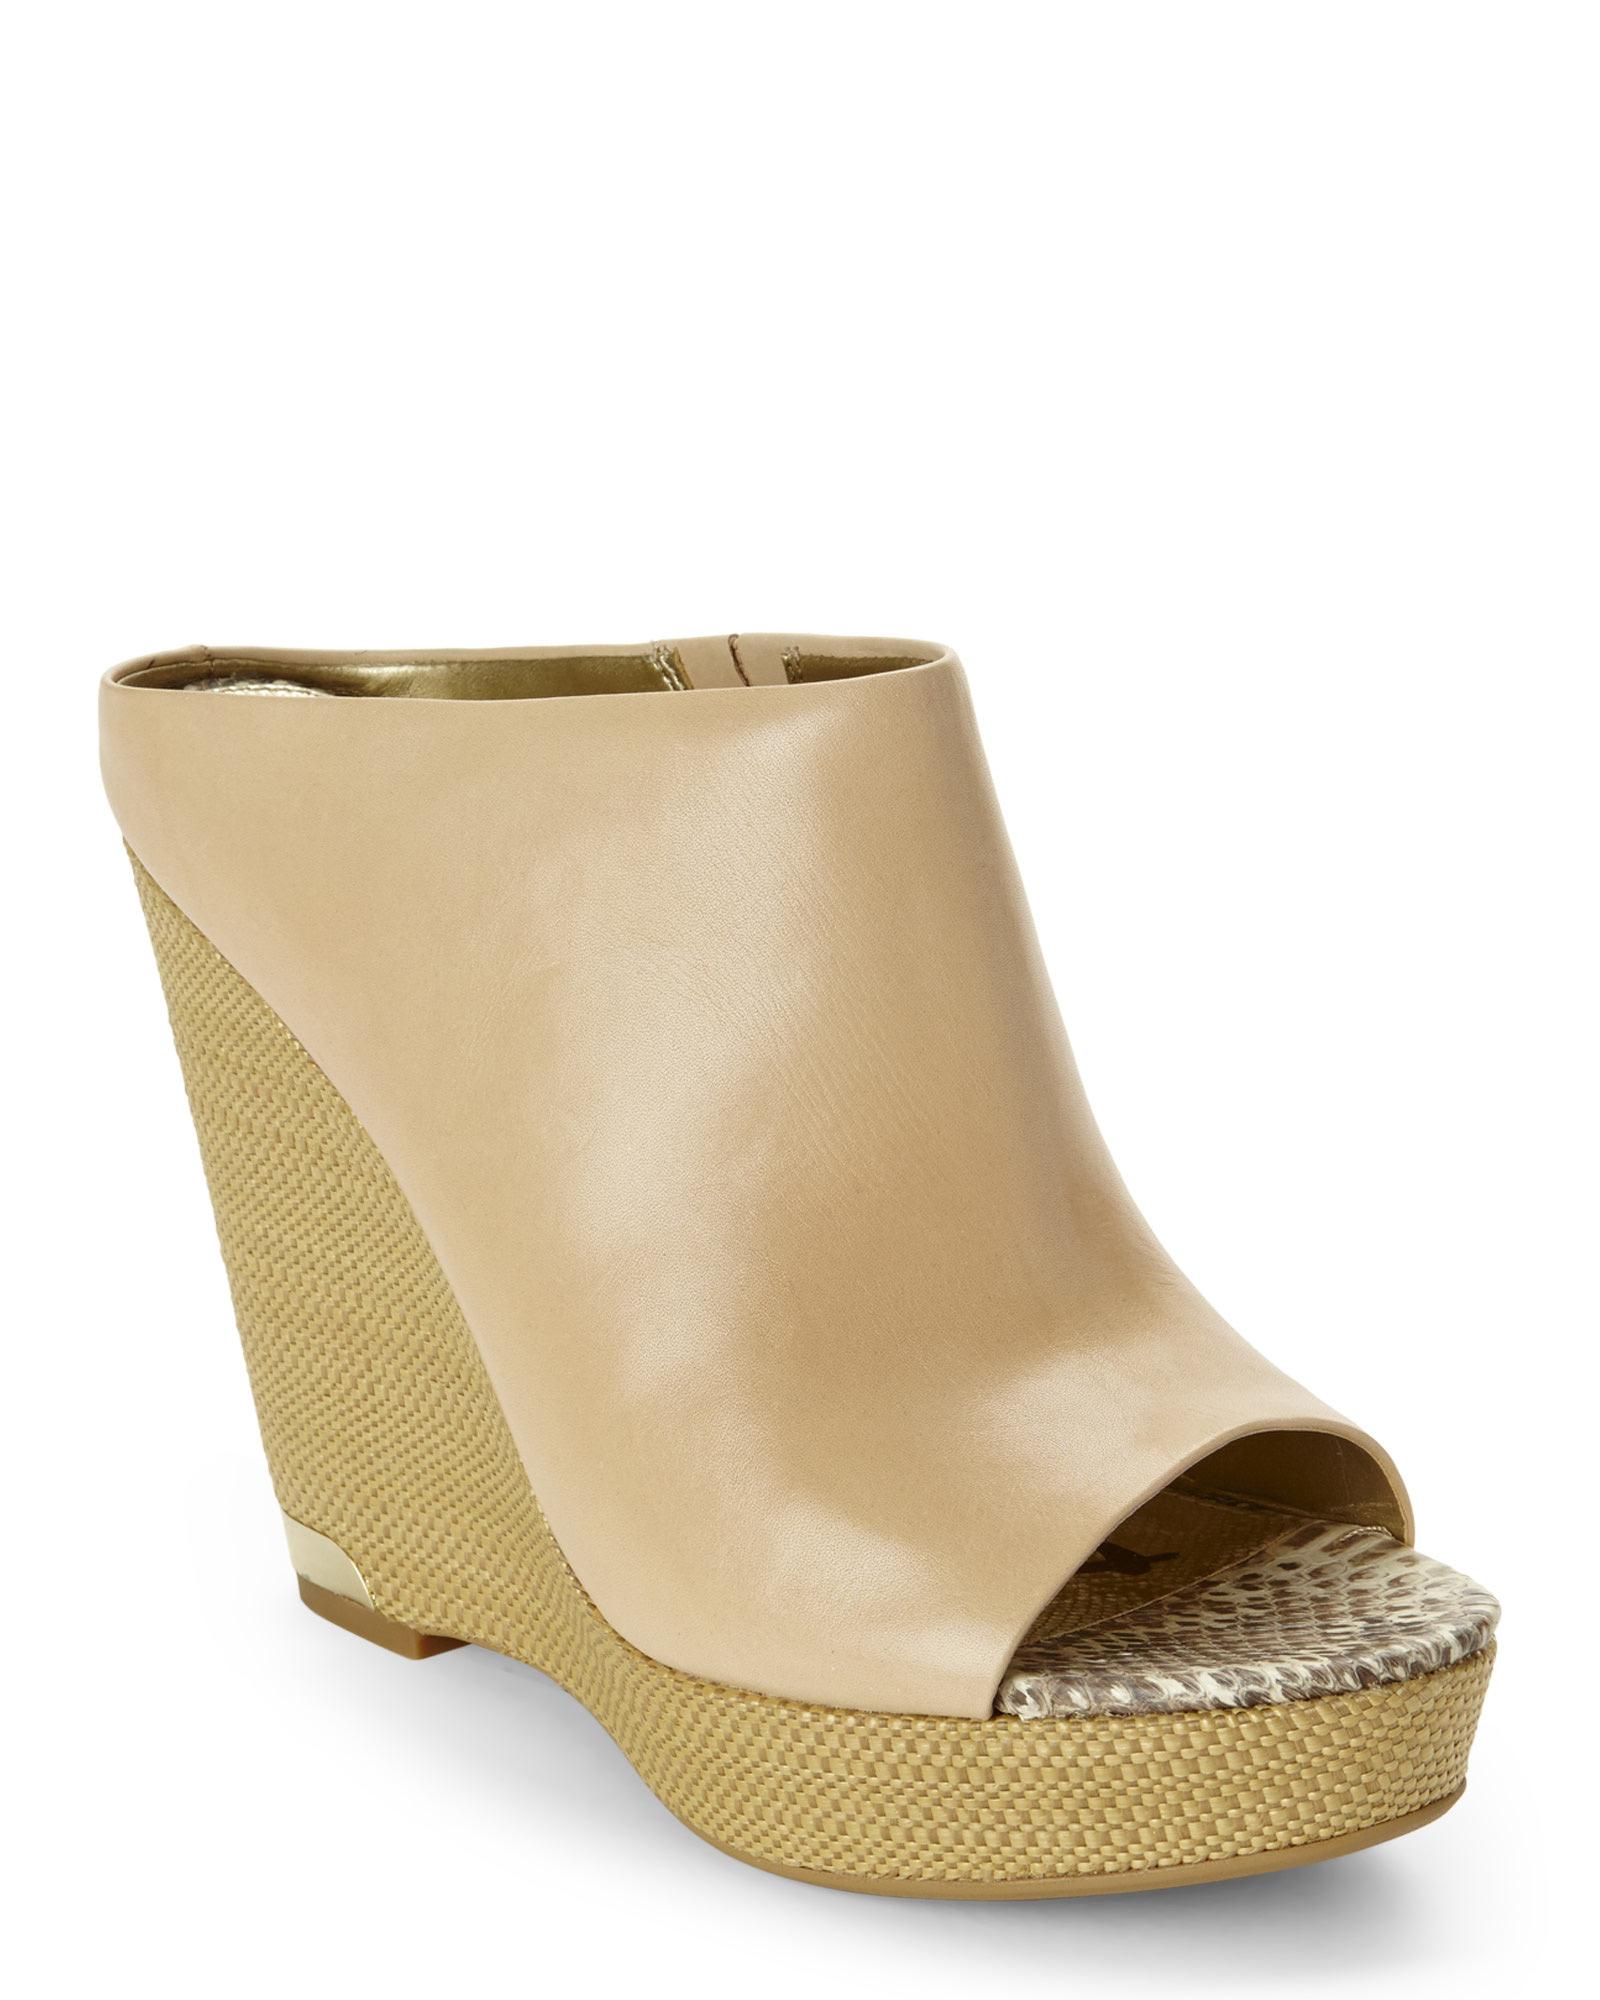 37623465cb105 Lyst - Sam Edelman Natural Naked Kylie Platform Wedge Mules in Natural